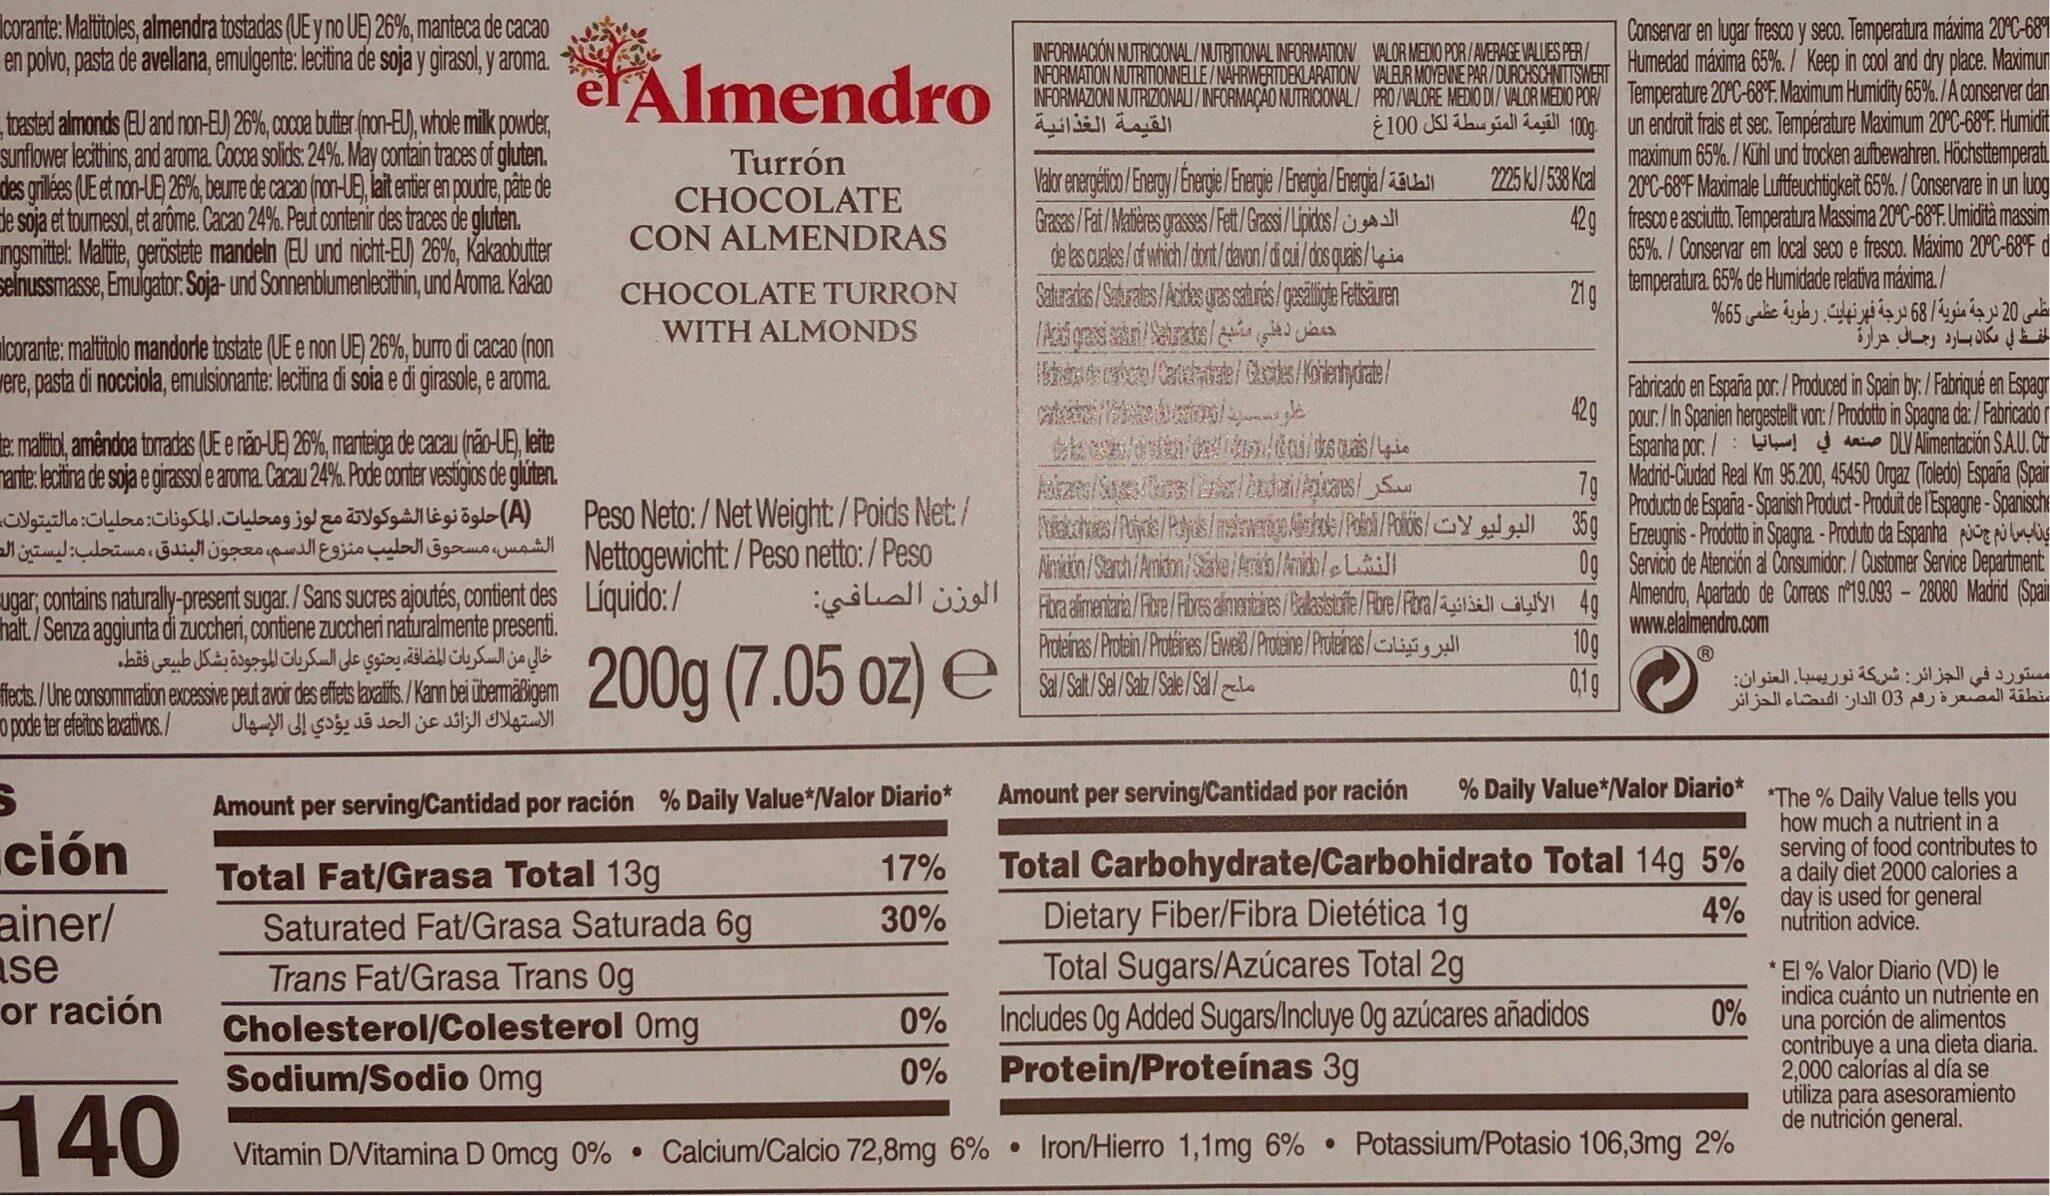 Turrón chocolate con almendras - Nutrition facts - fr